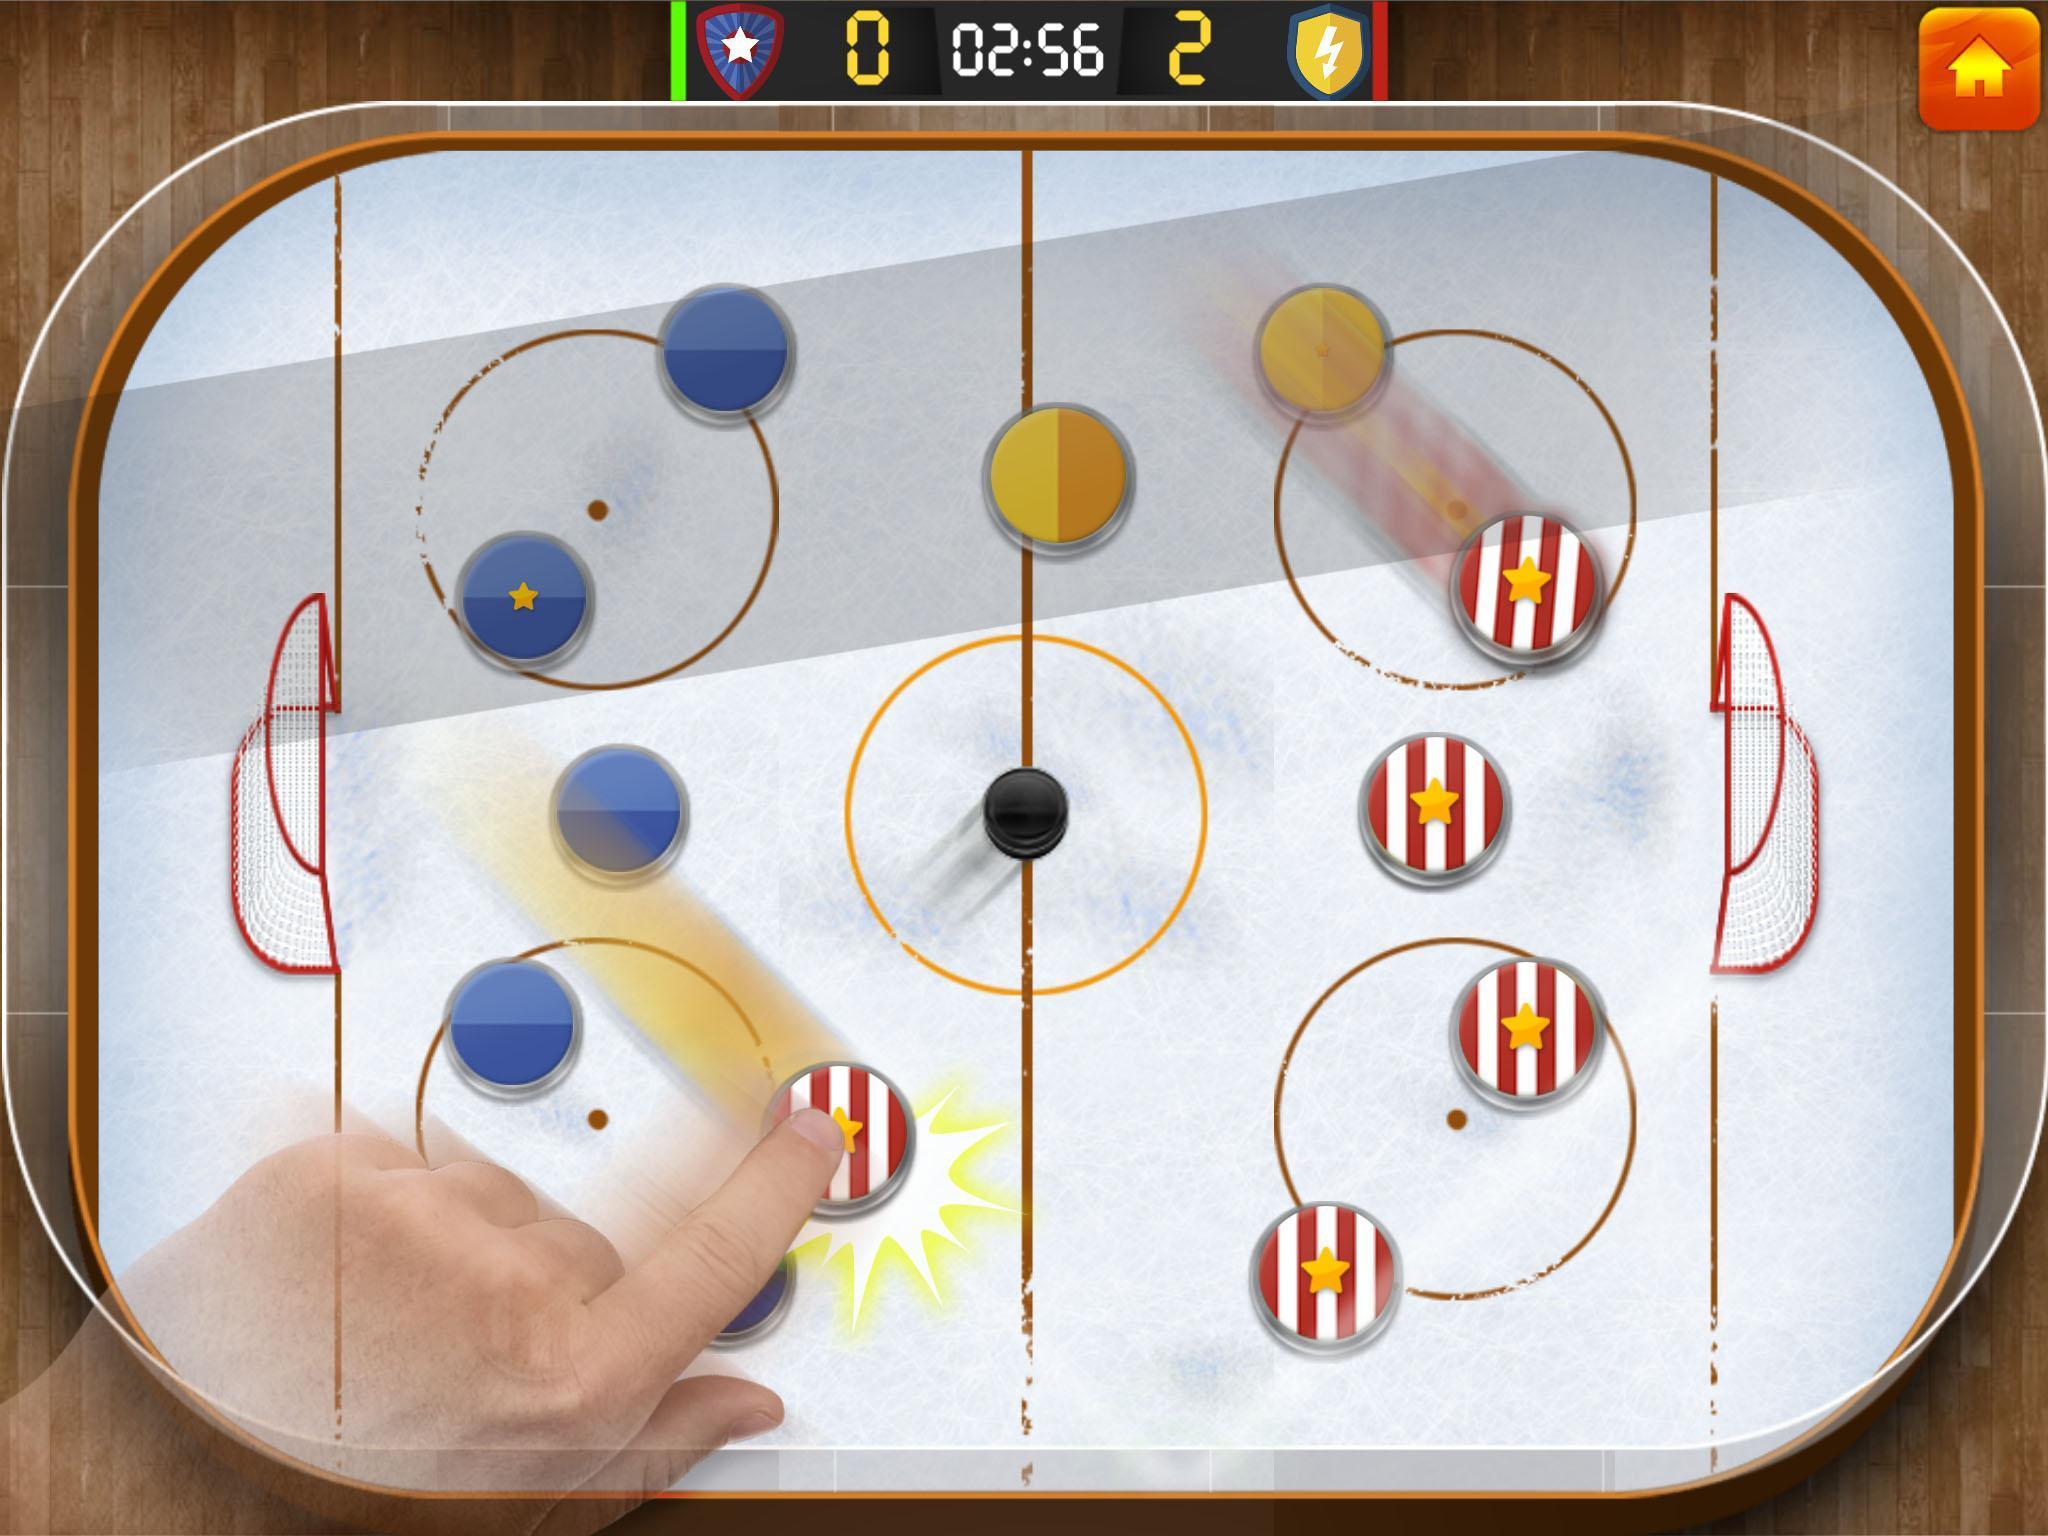 Ice Hockey League FREE 2.1 Screenshot 1